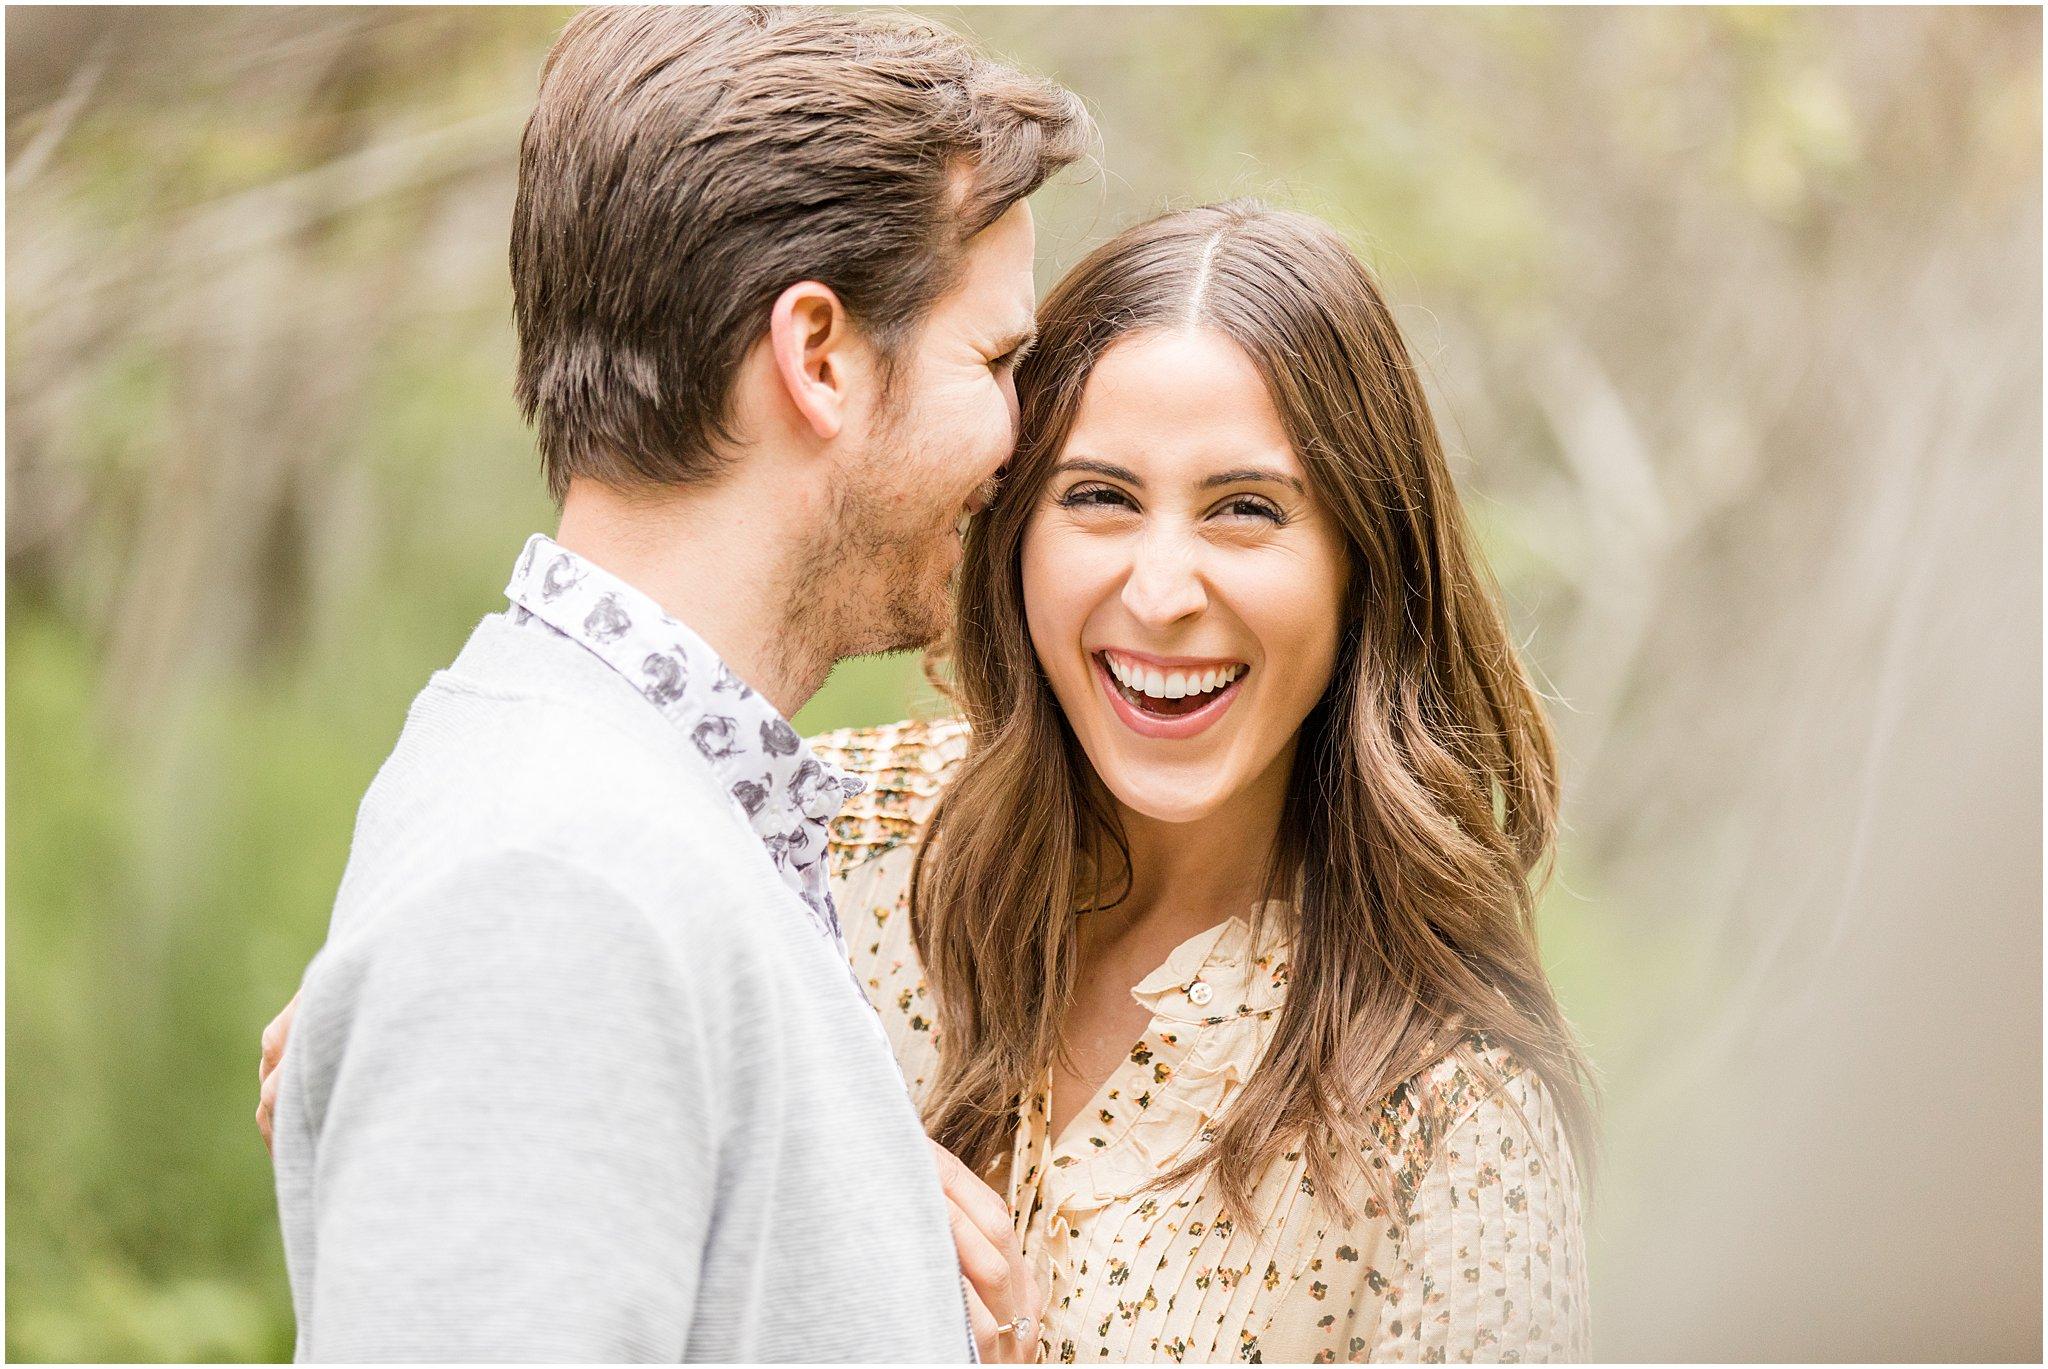 2019 carmel highlands garrapata state park couples portrait session bay area wedding photographer_0003.jpg